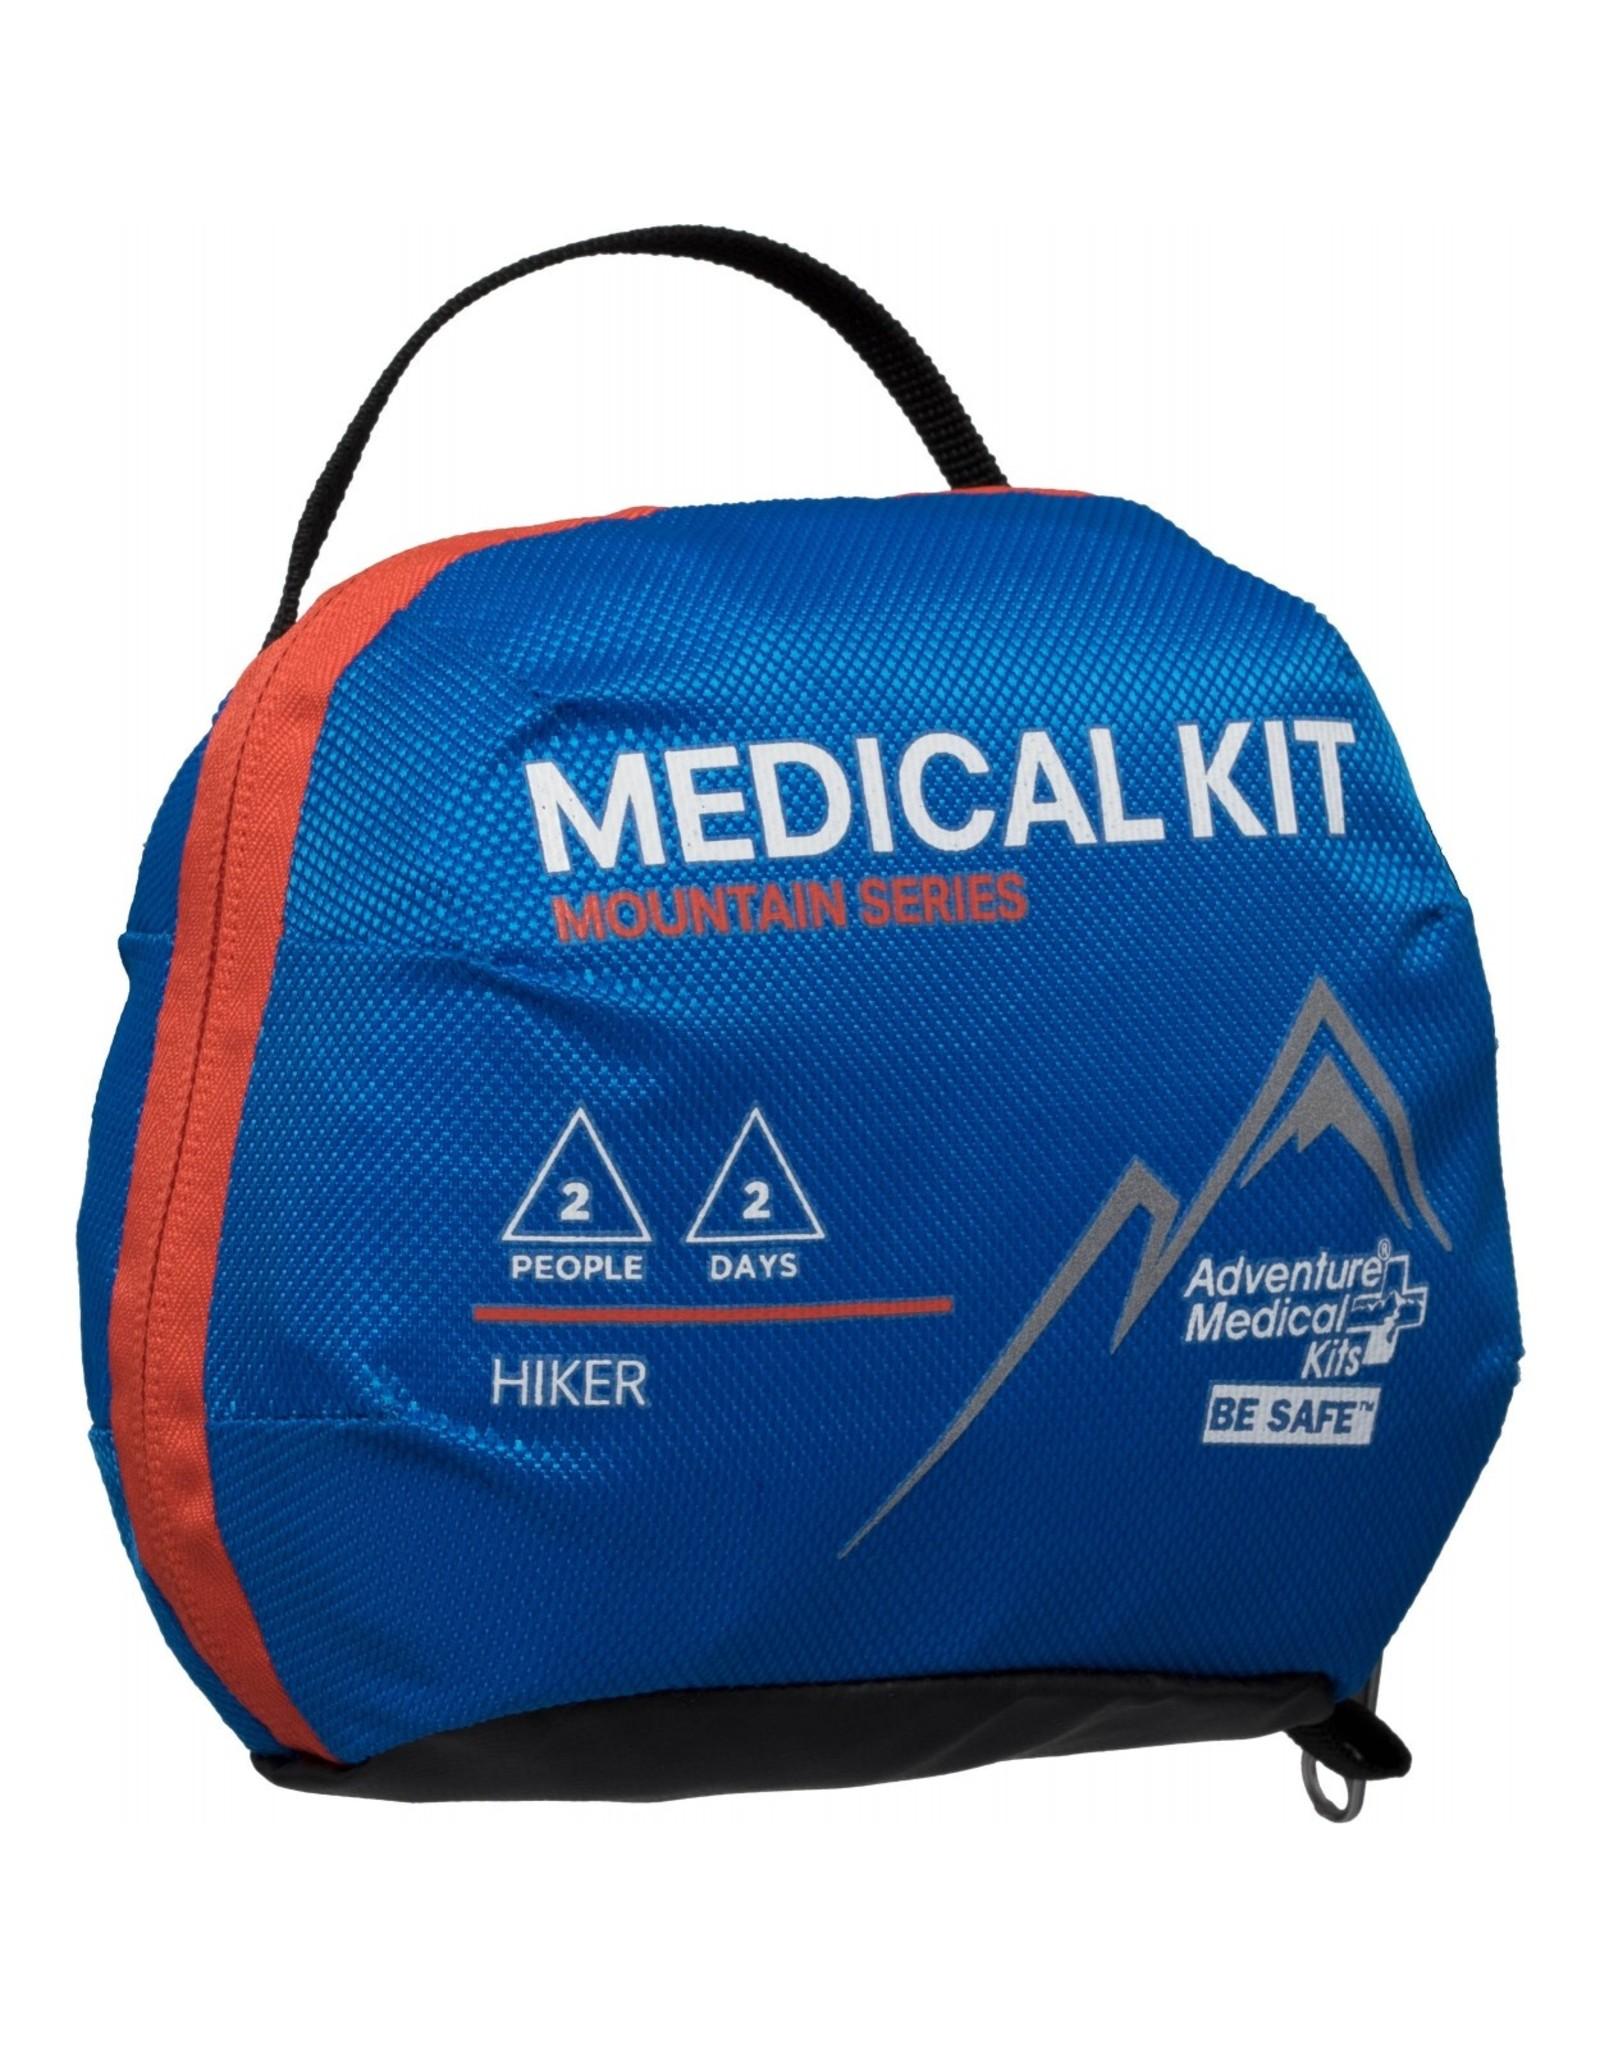 Adventure Medical Kits Adventure Medical Kits Mountain Series Intl. Hiker